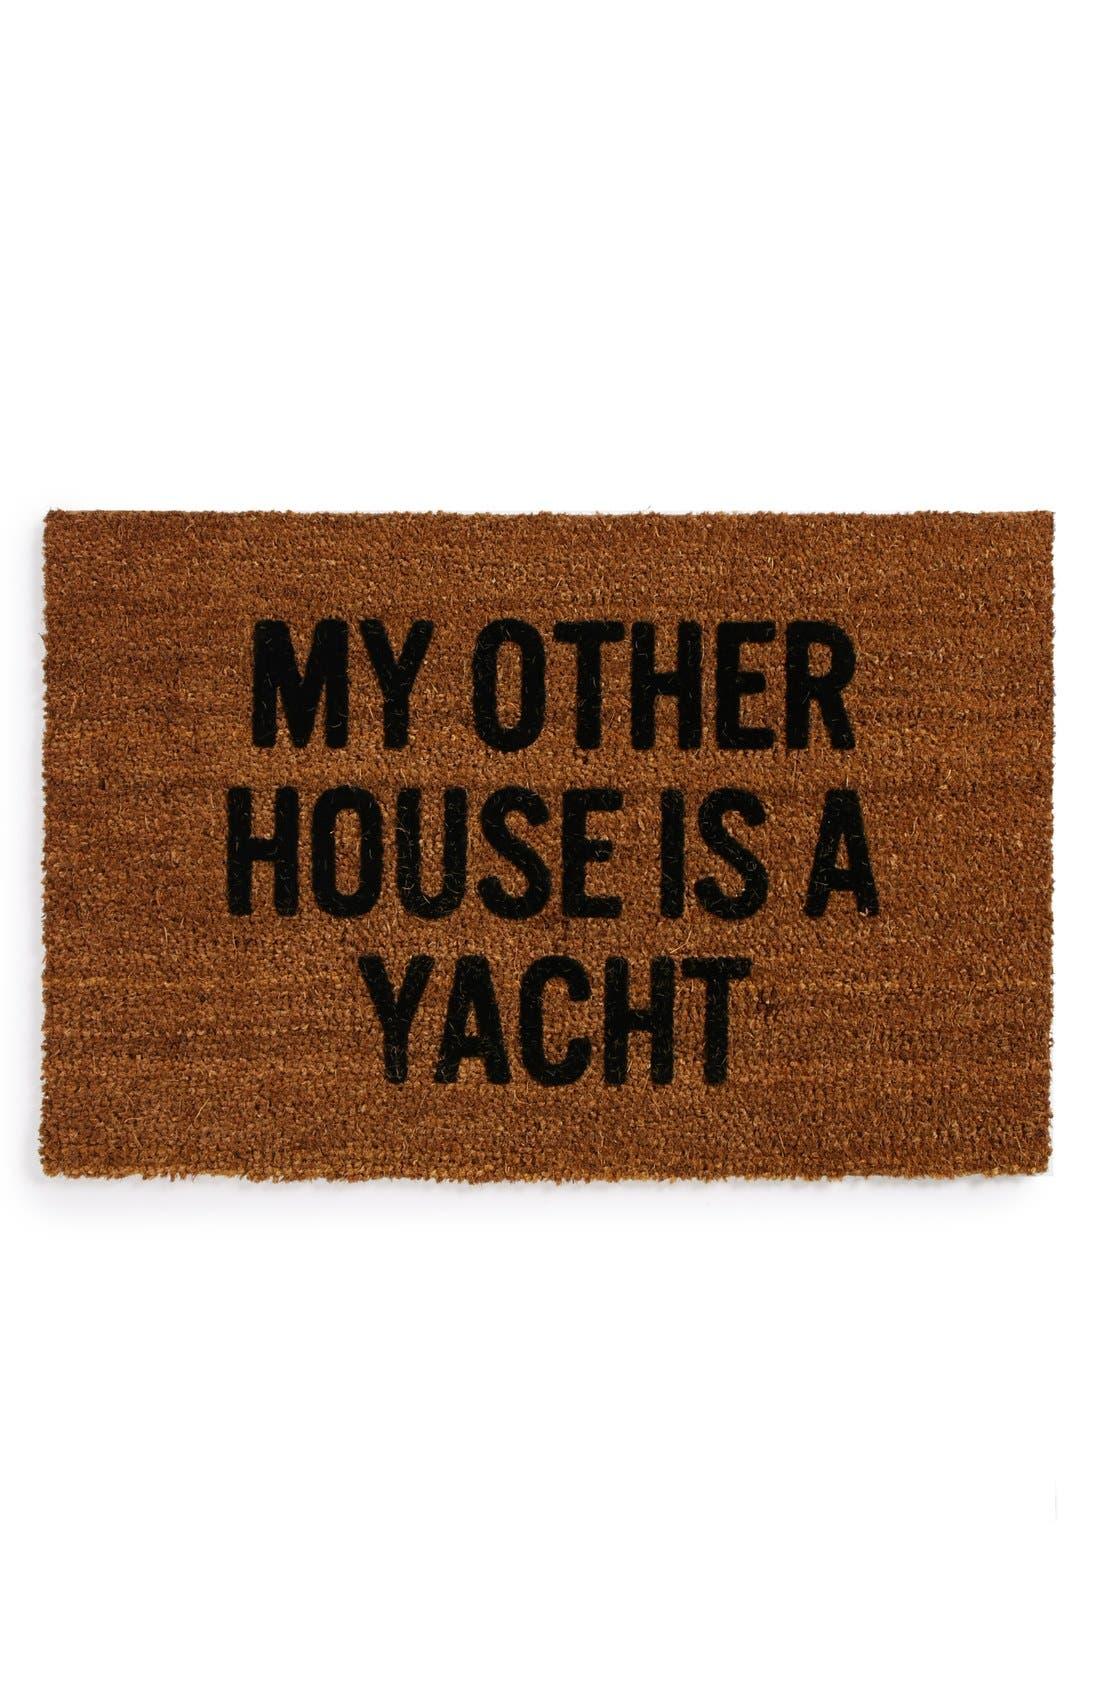 Alternate Image 1 Selected - Reed Wilson Design 'Yacht' Doormat